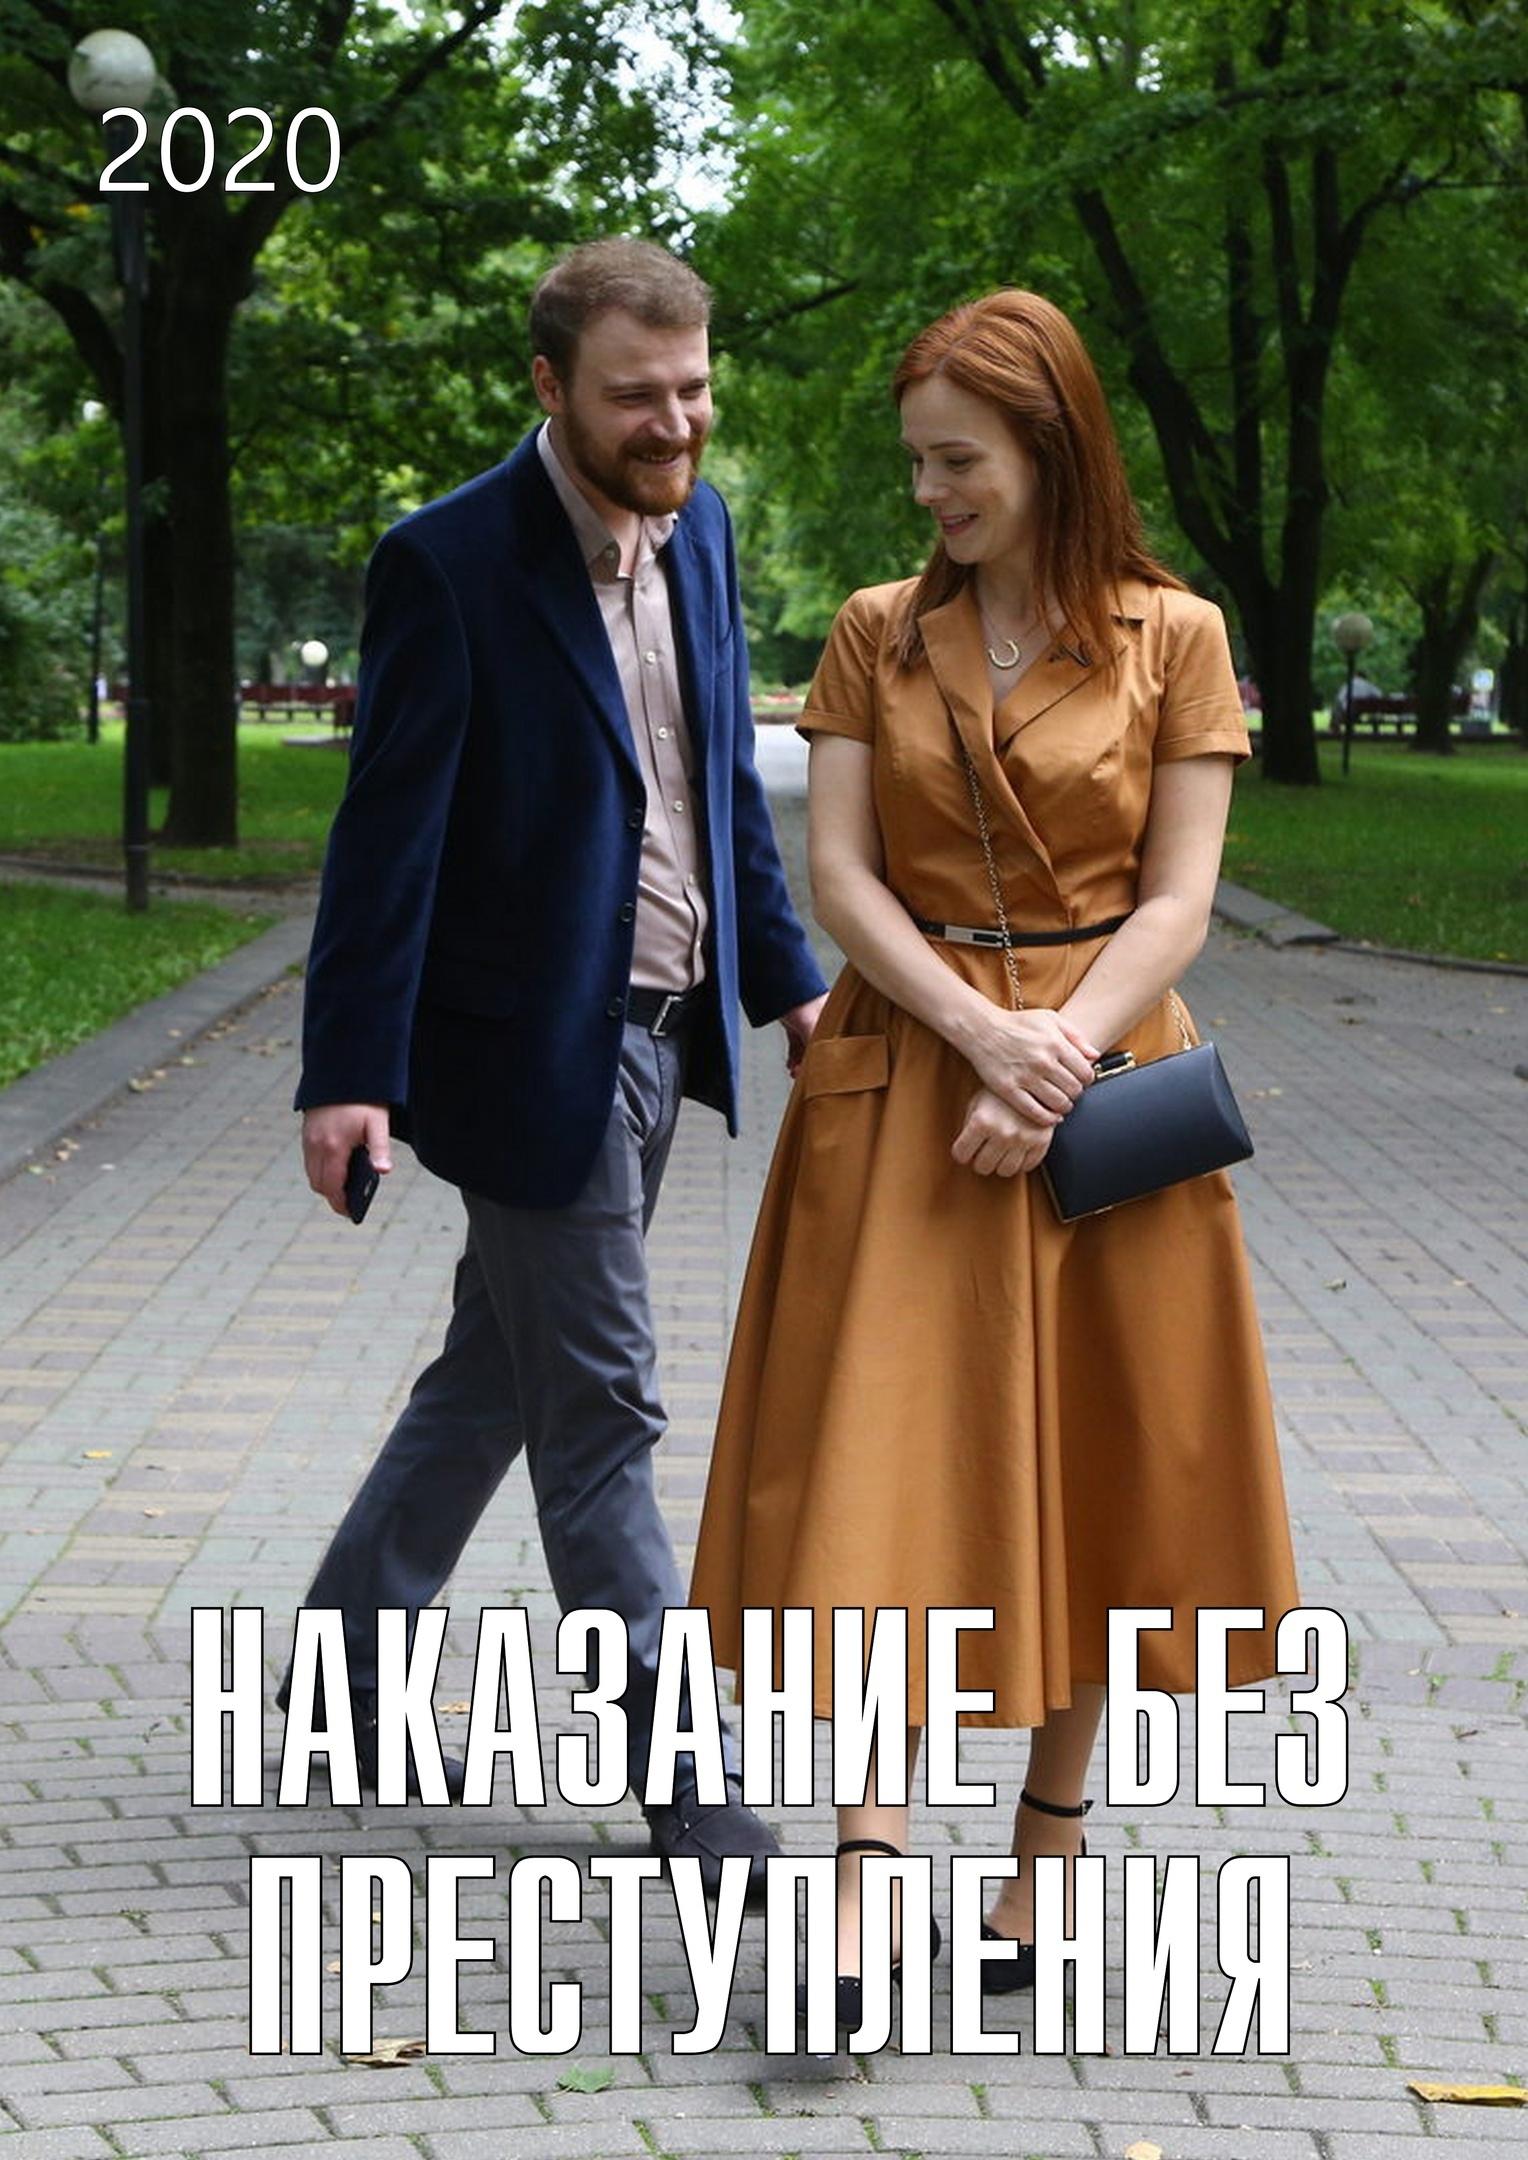 Мелодрама «Haкaзaниe бeз пpecтyплeния» (2020) 1-4 серия из 4 HD